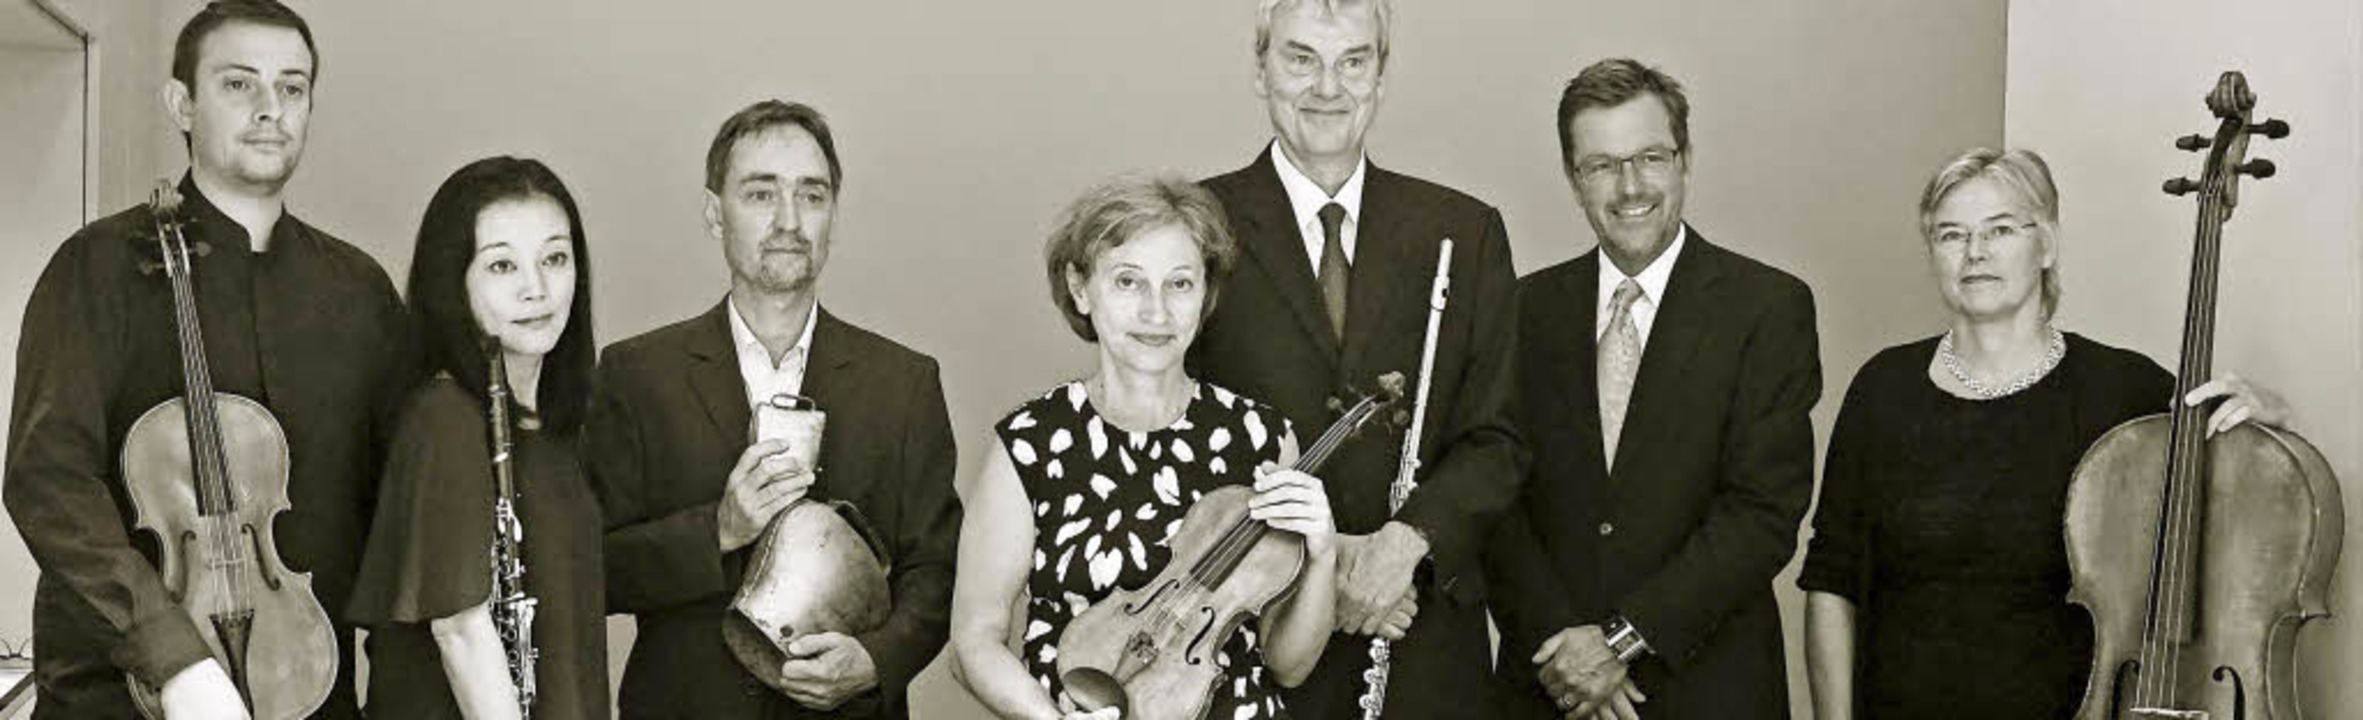 Als Interpreten Neuer Musik internatio...tzt: das Freiburger ensemble recherche  | Foto: Pro